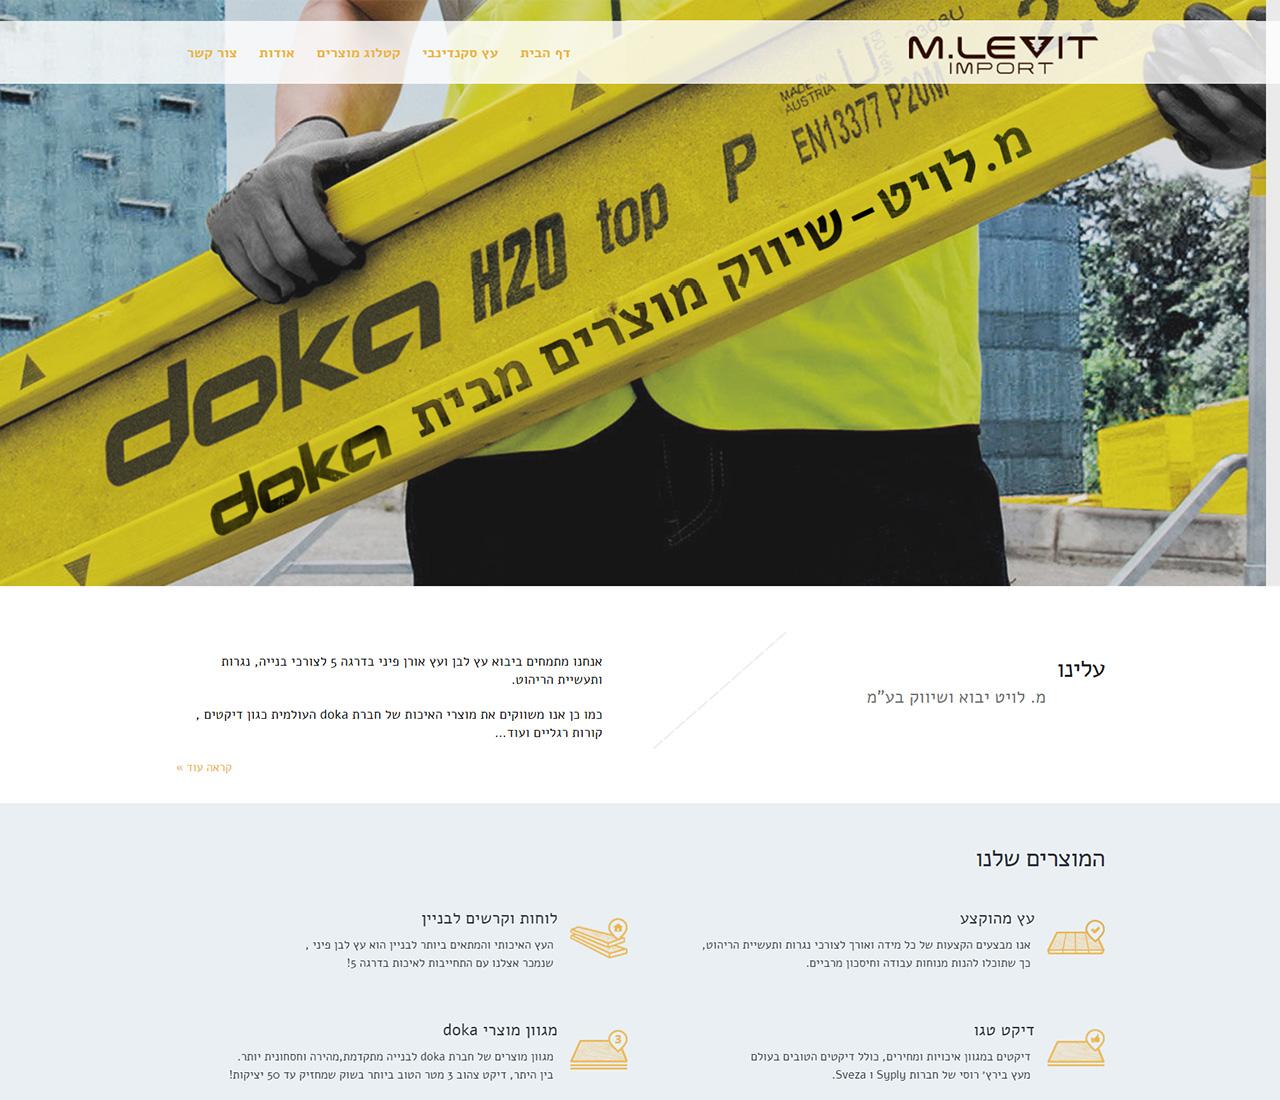 M-Levit Import – אתר תדמית לחברת יבוא